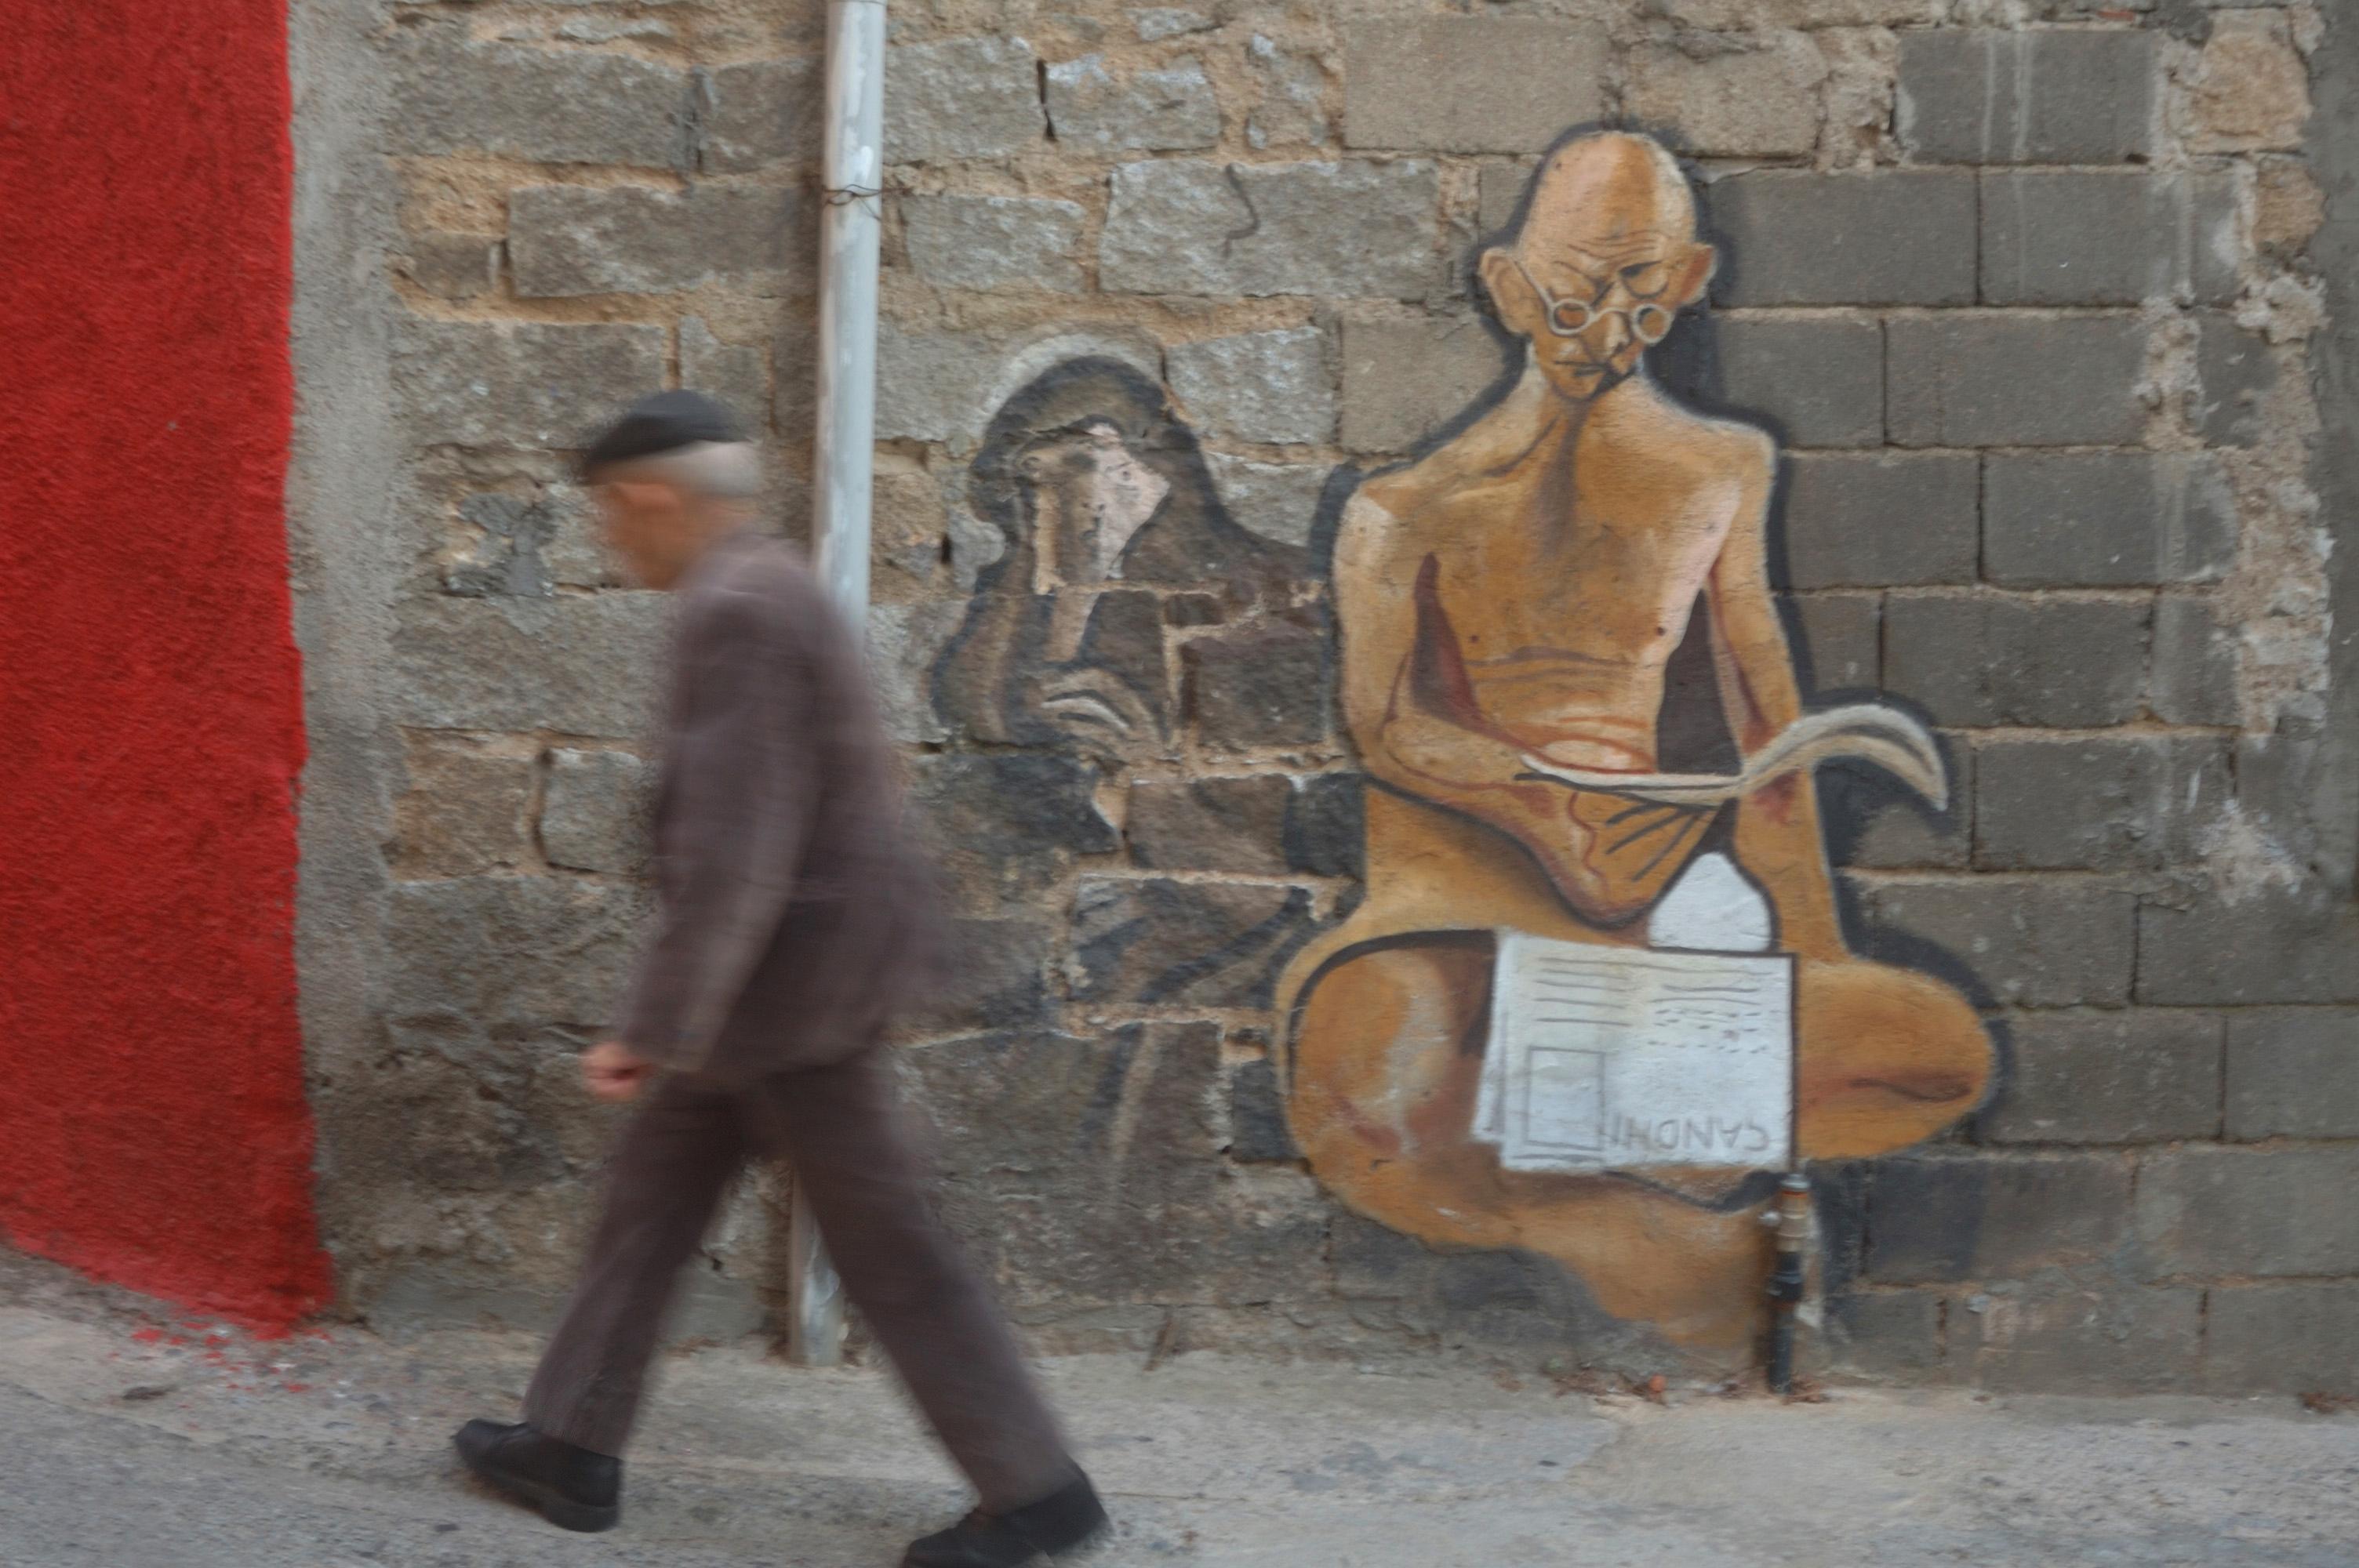 A village mural in Sardinia, Italy.